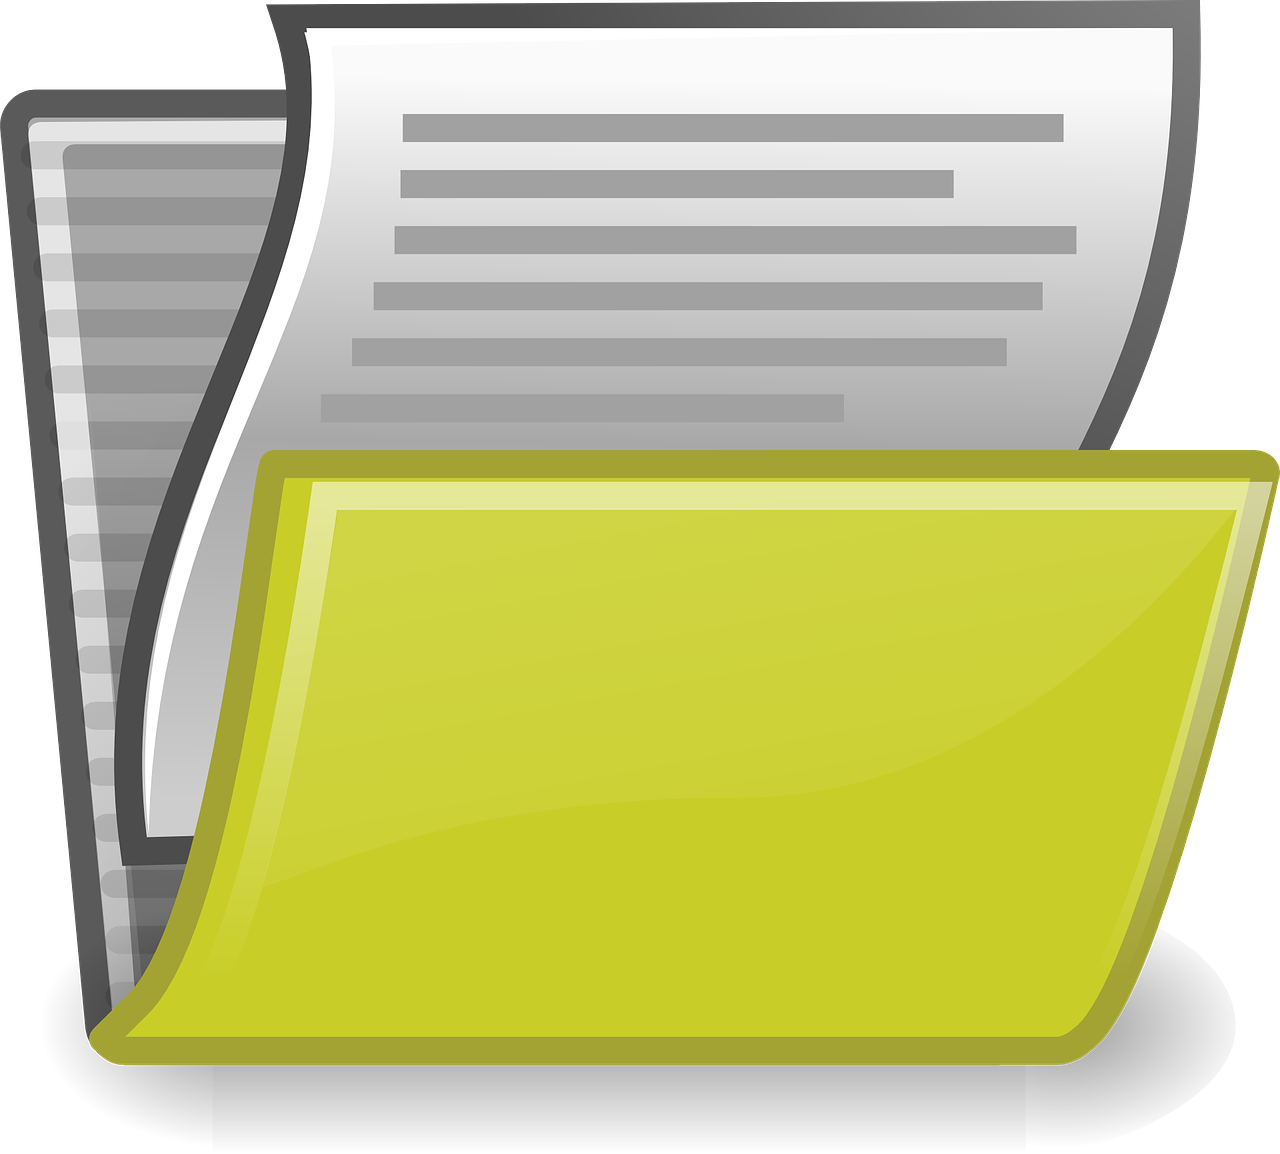 folder, files, paper